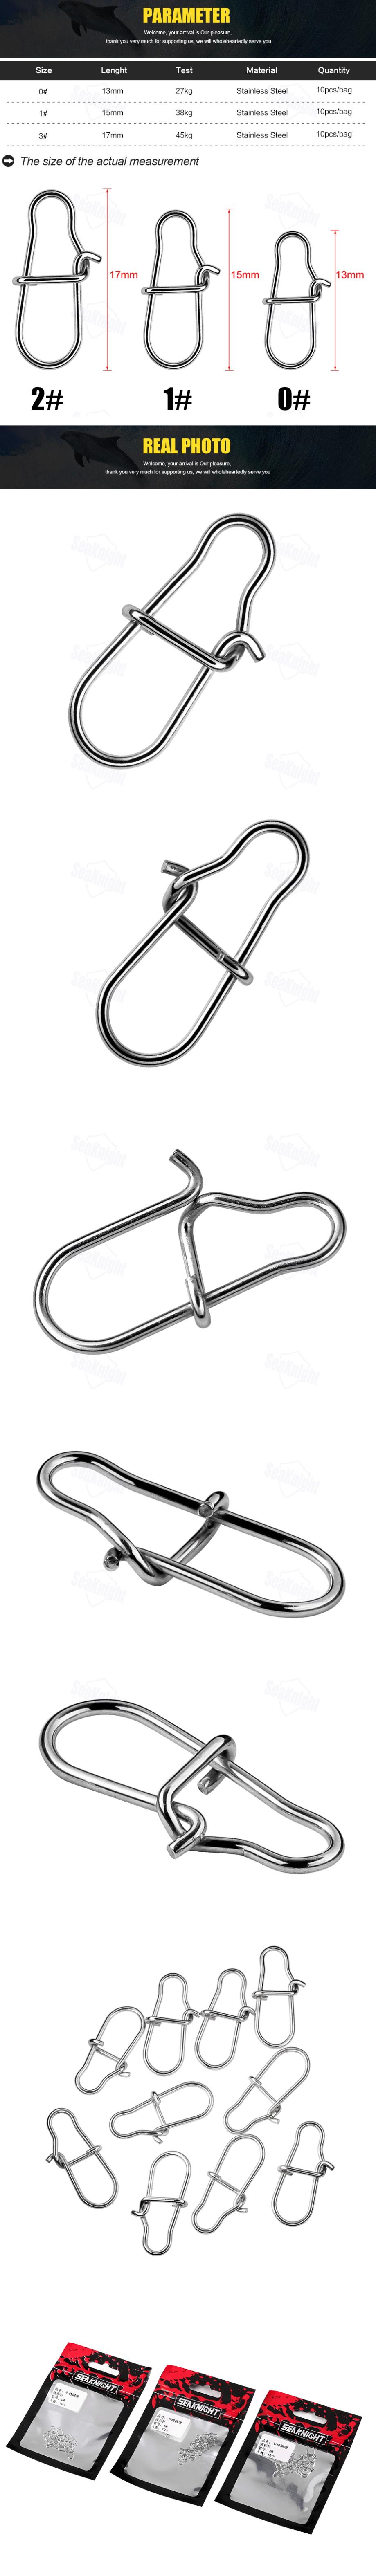 SeaKnight 10bag/100pcs 0# 1# 2# Stainless Steel Fishing Swivels Connectors Rolling Swivels Snaps